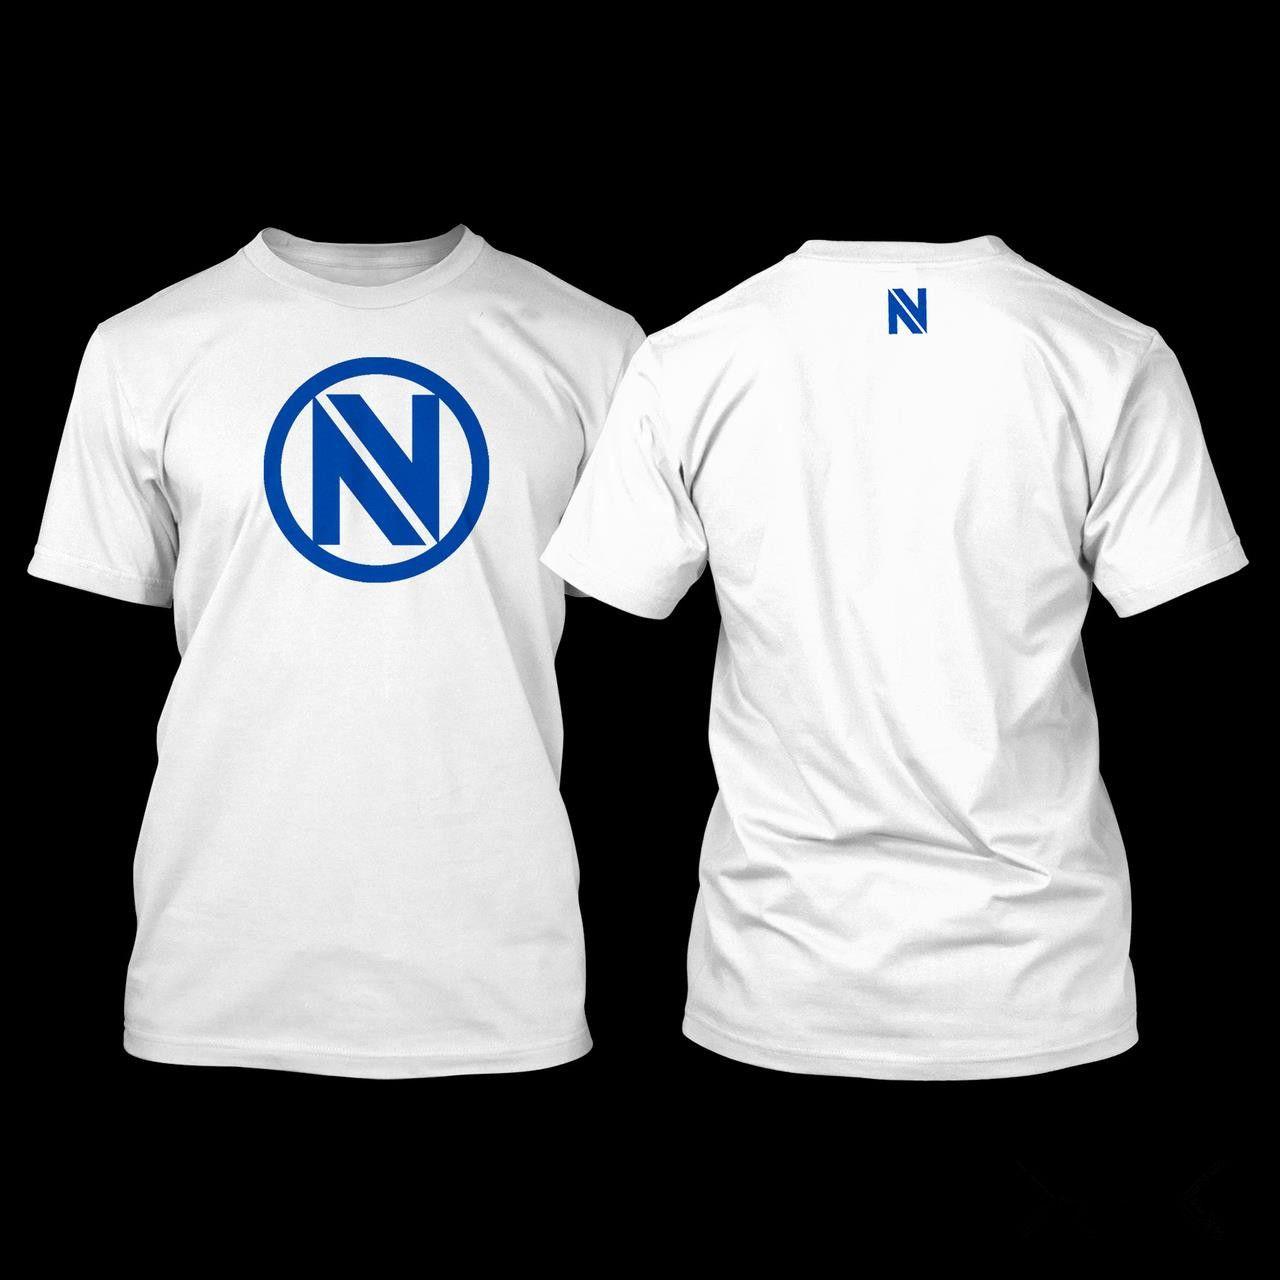 Shirt design online uk - Wholesale Exclusive Design Cs Go Csgo E Sport Game Team Envyus Short Sleeve T Shirt Casual Fashion Gaming T Shirt Camiseta Top Tees Cotton